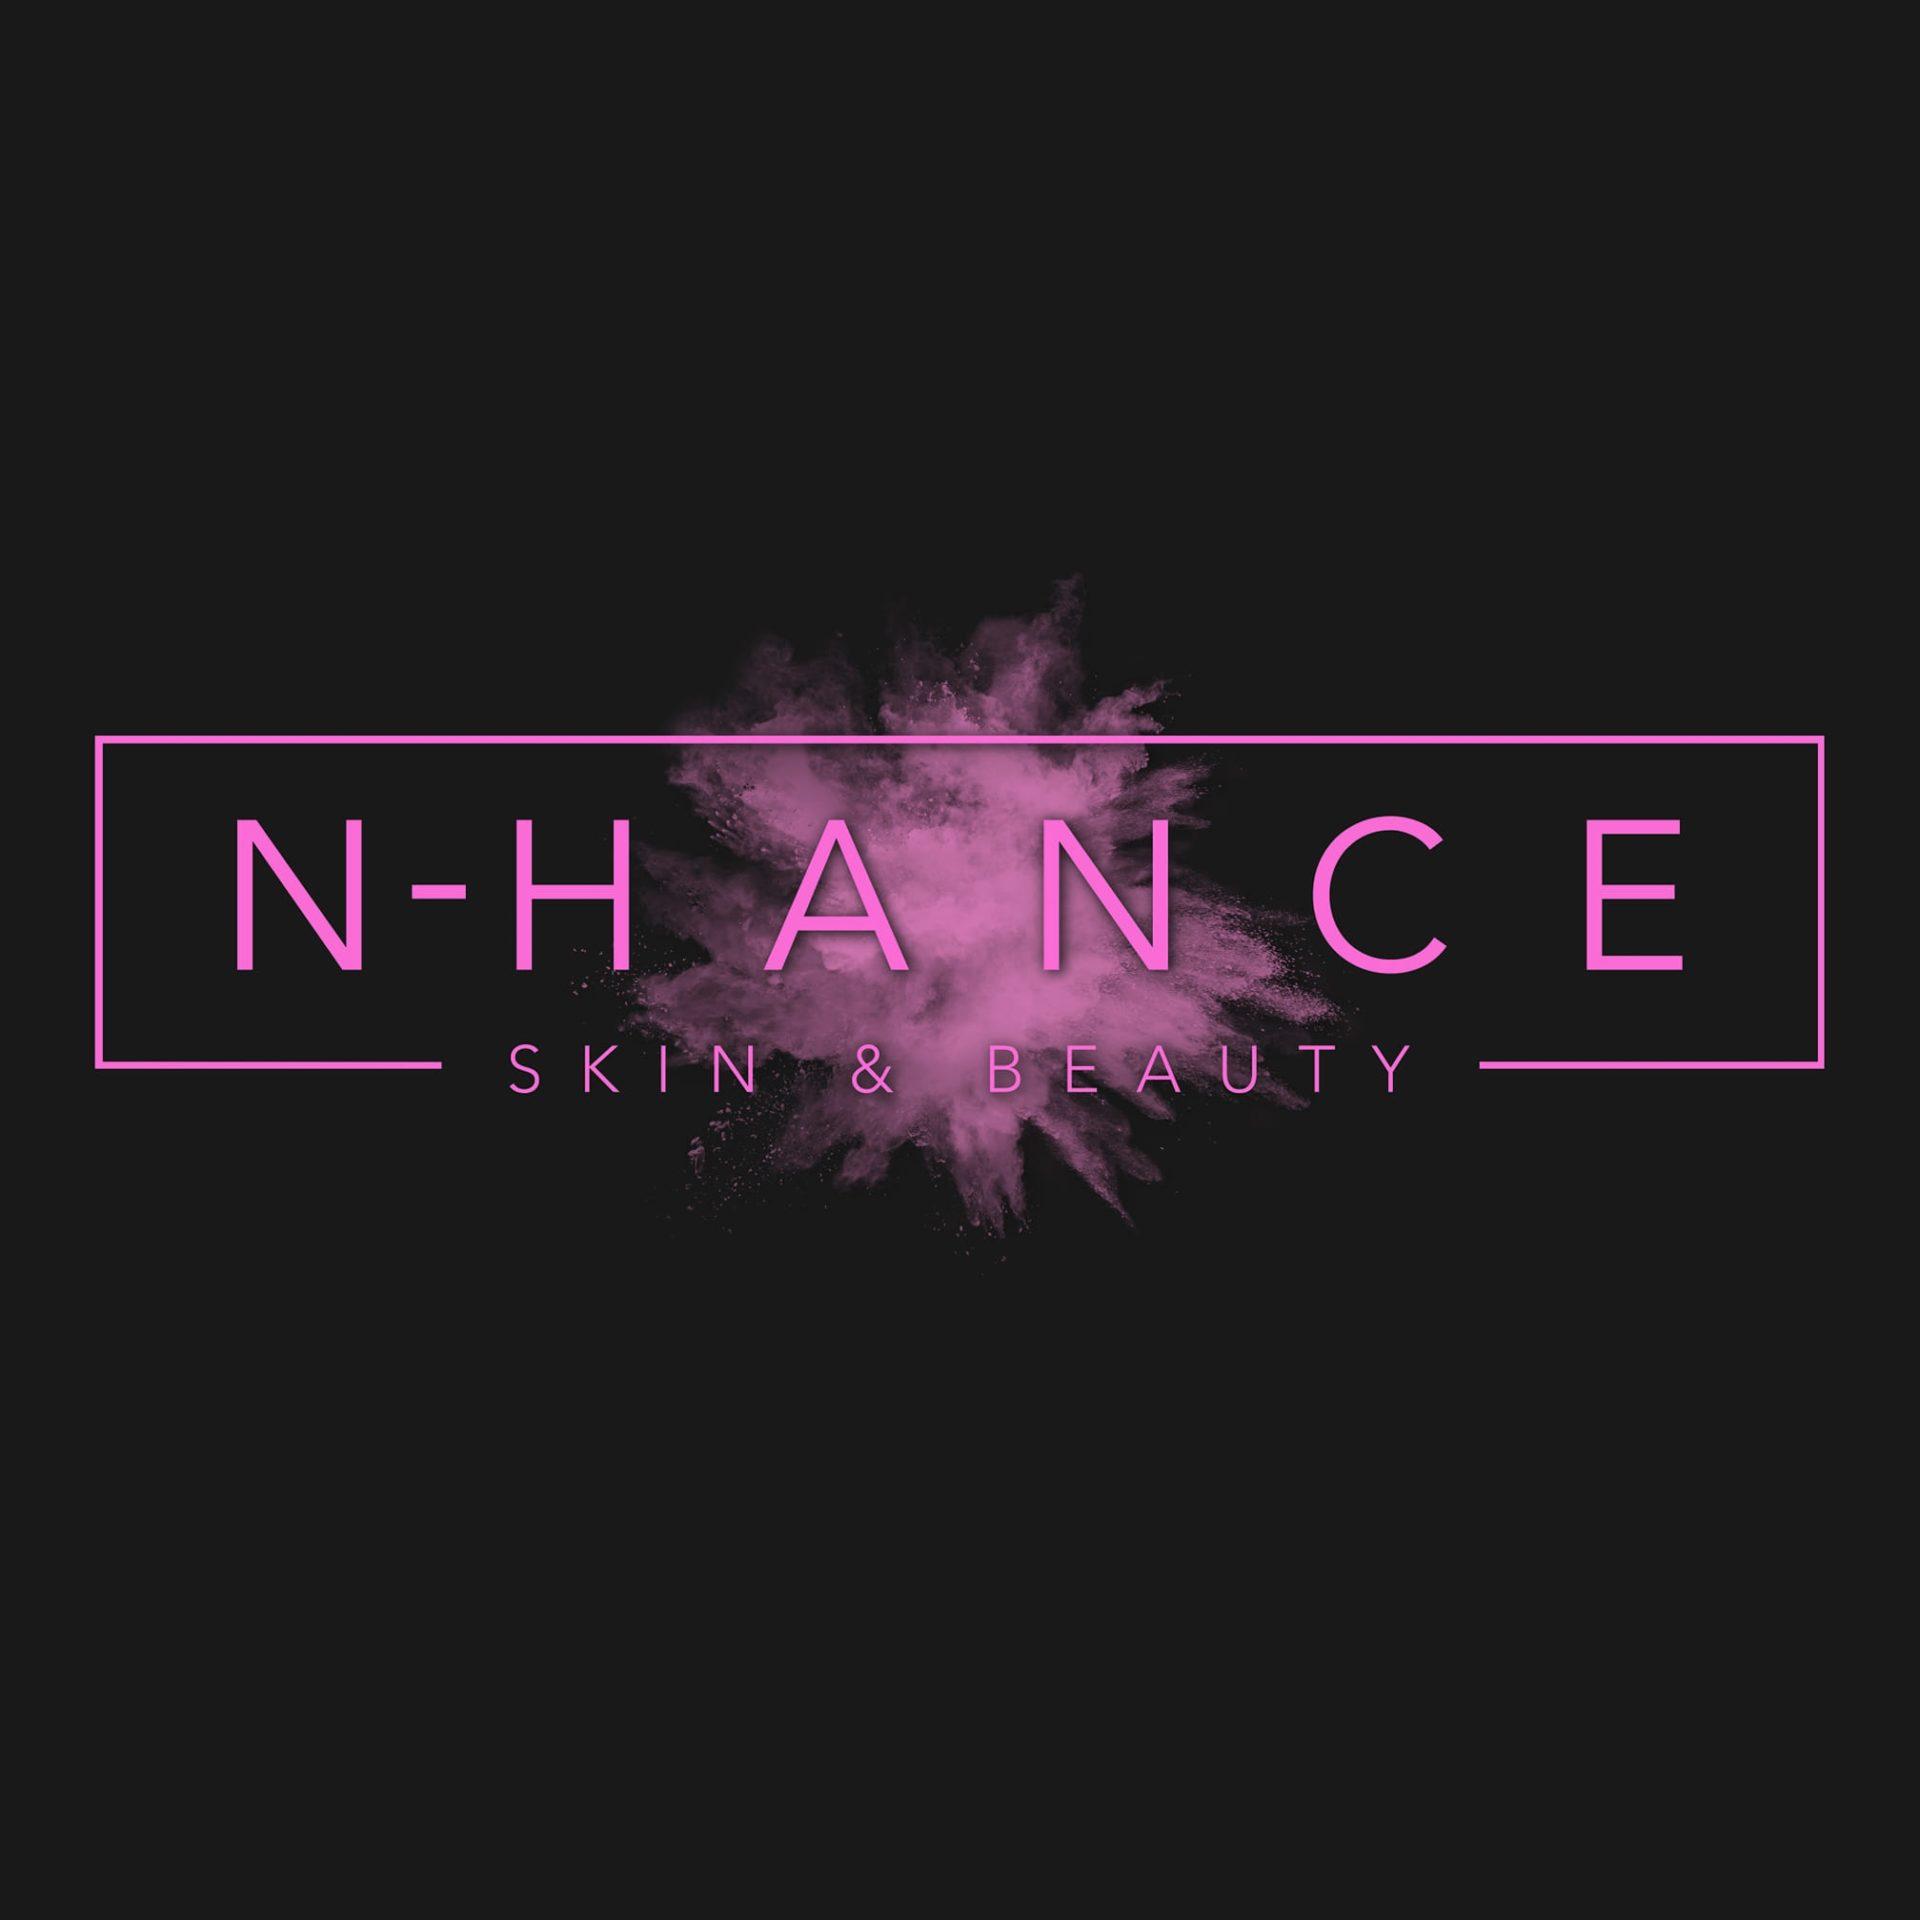 Nhance Skin and Beauty